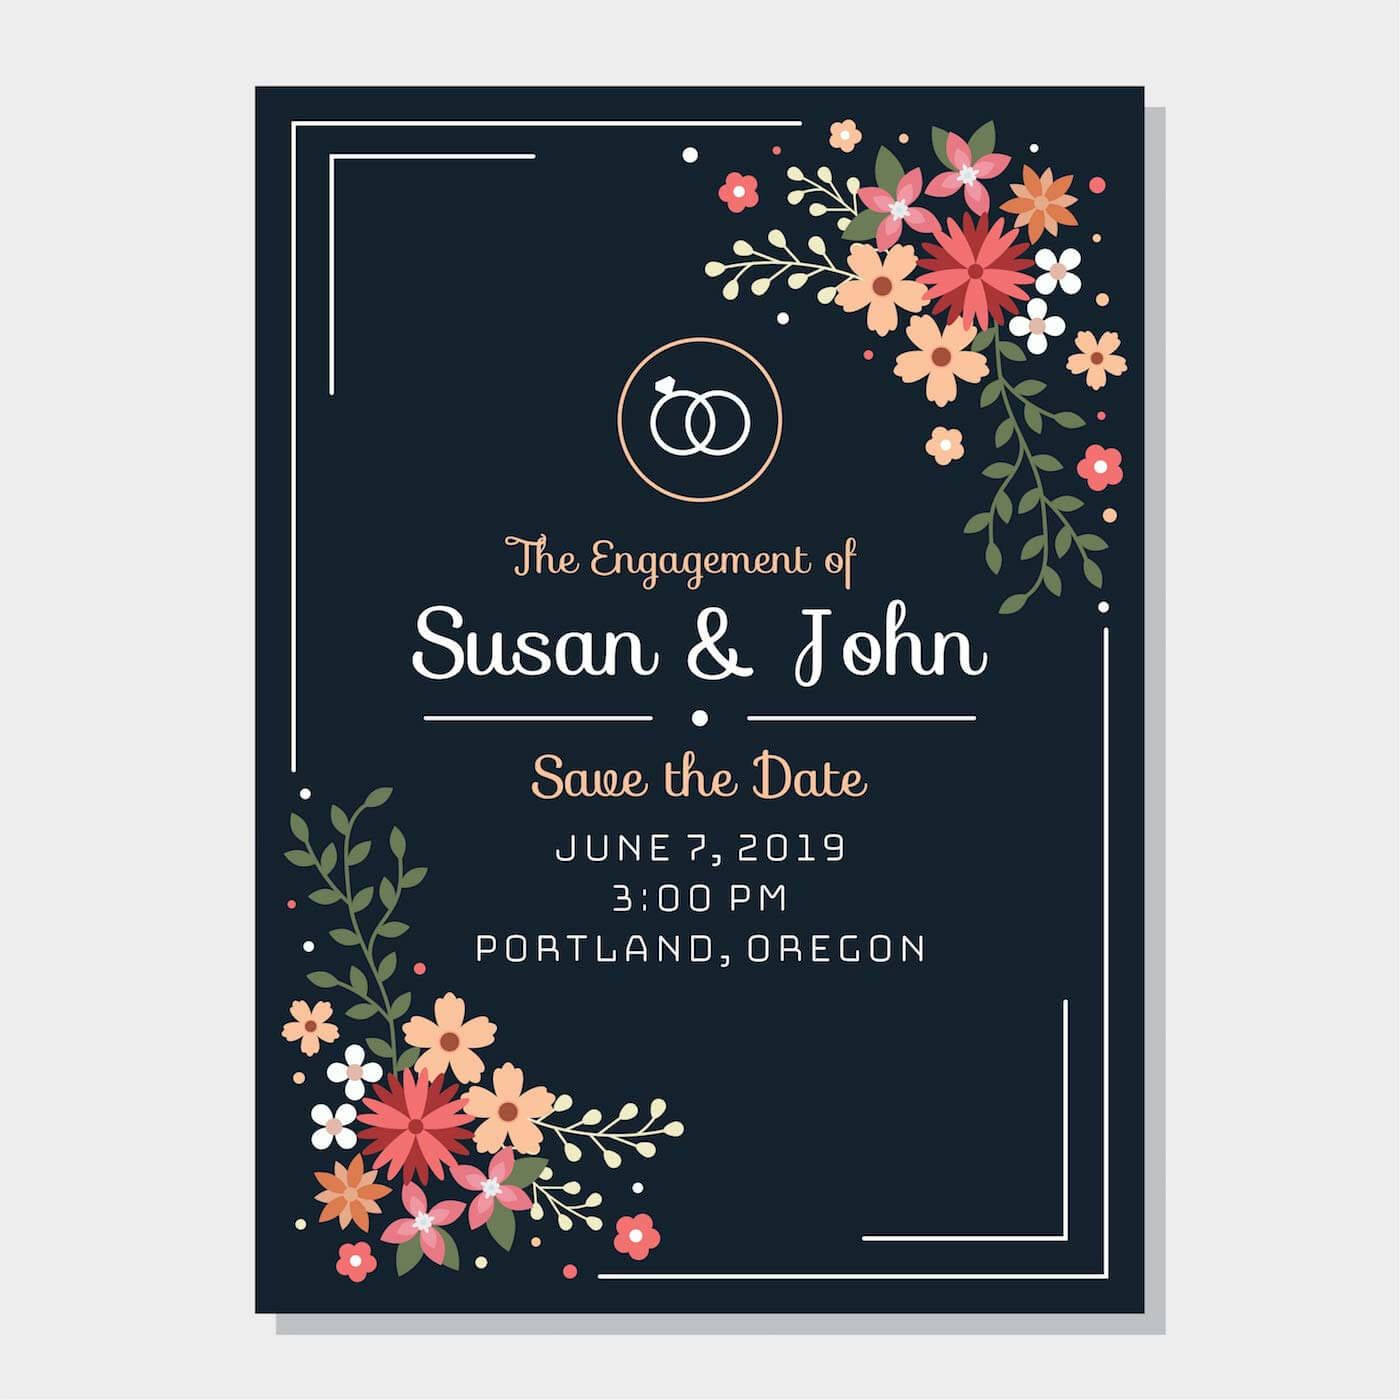 Engagement Invitation Free Vector Art - (888 Free Downloads) With Engagement Invitation Card Template